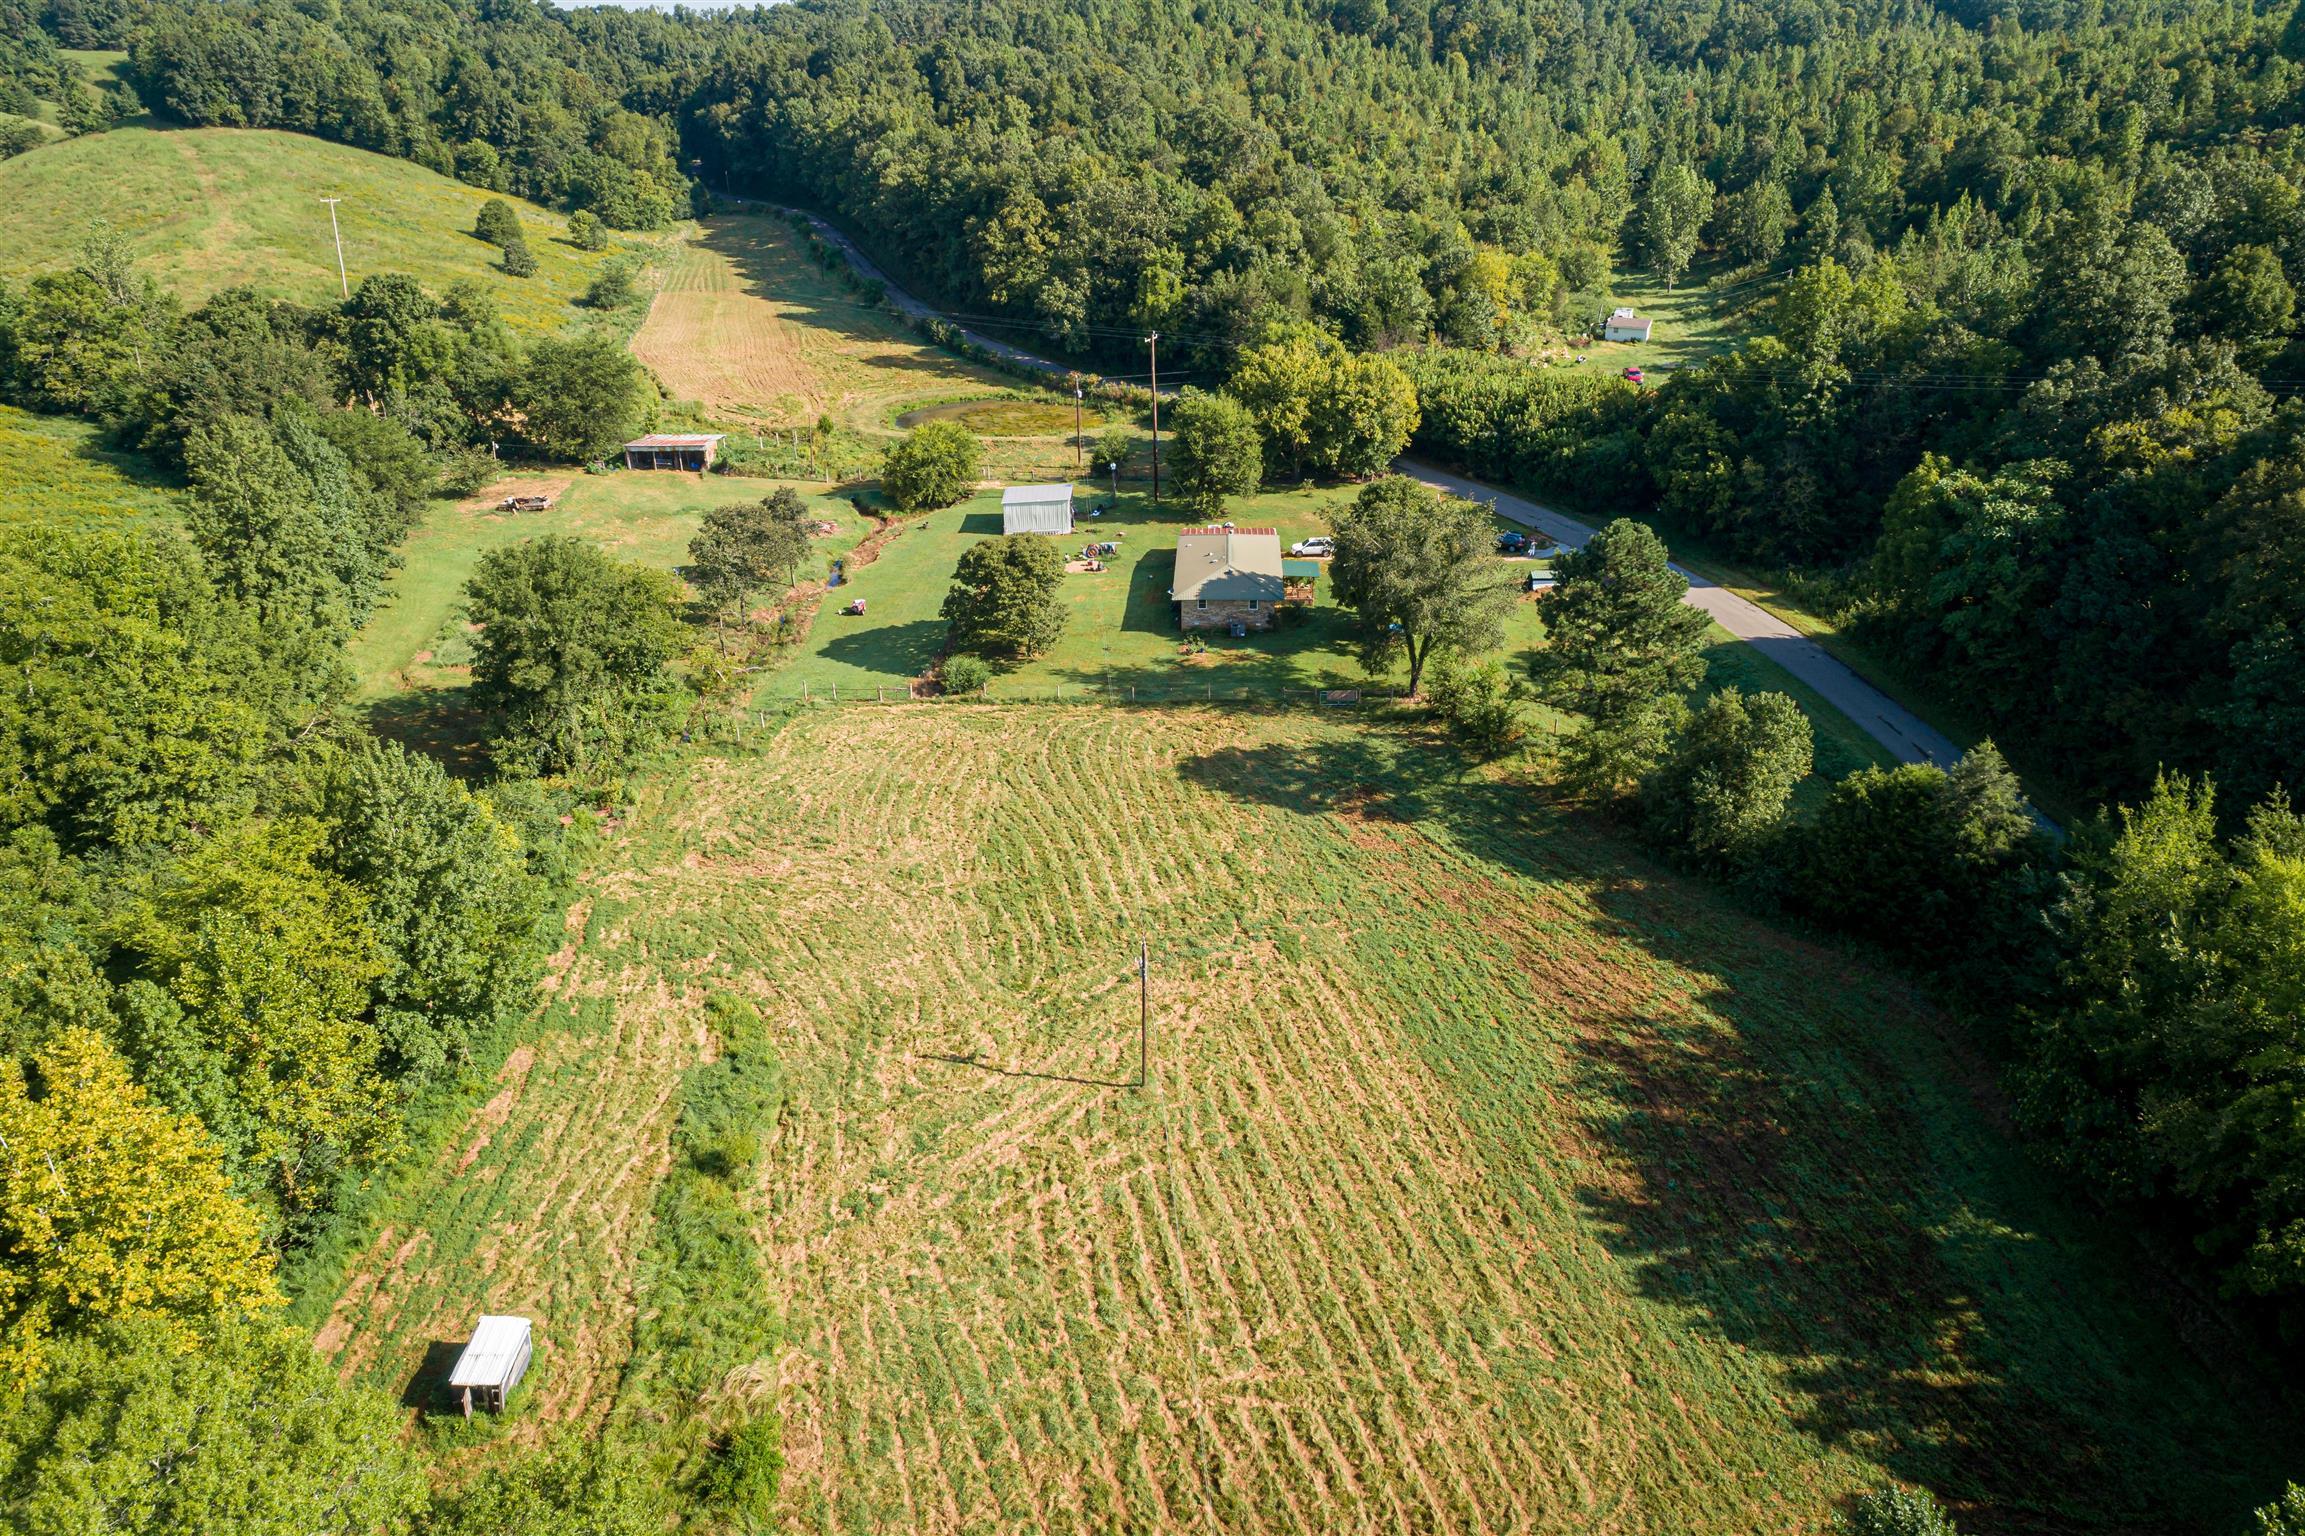 231 Beasley Hollow Rd, Linden, TN 37096 - Linden, TN real estate listing